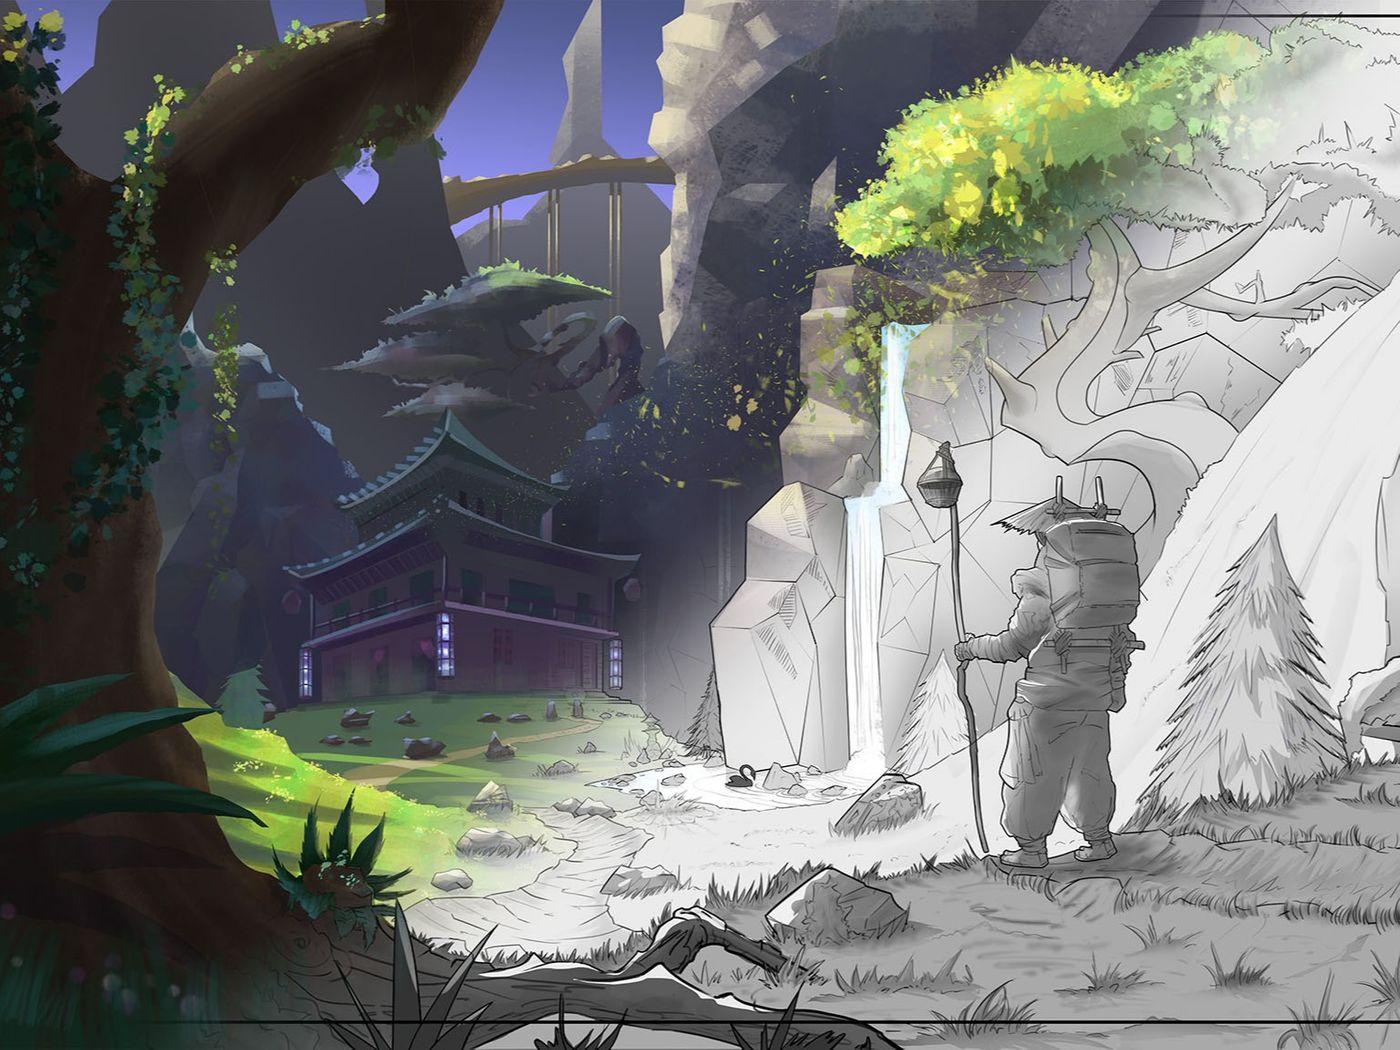 Digital Concept Art and Illustration